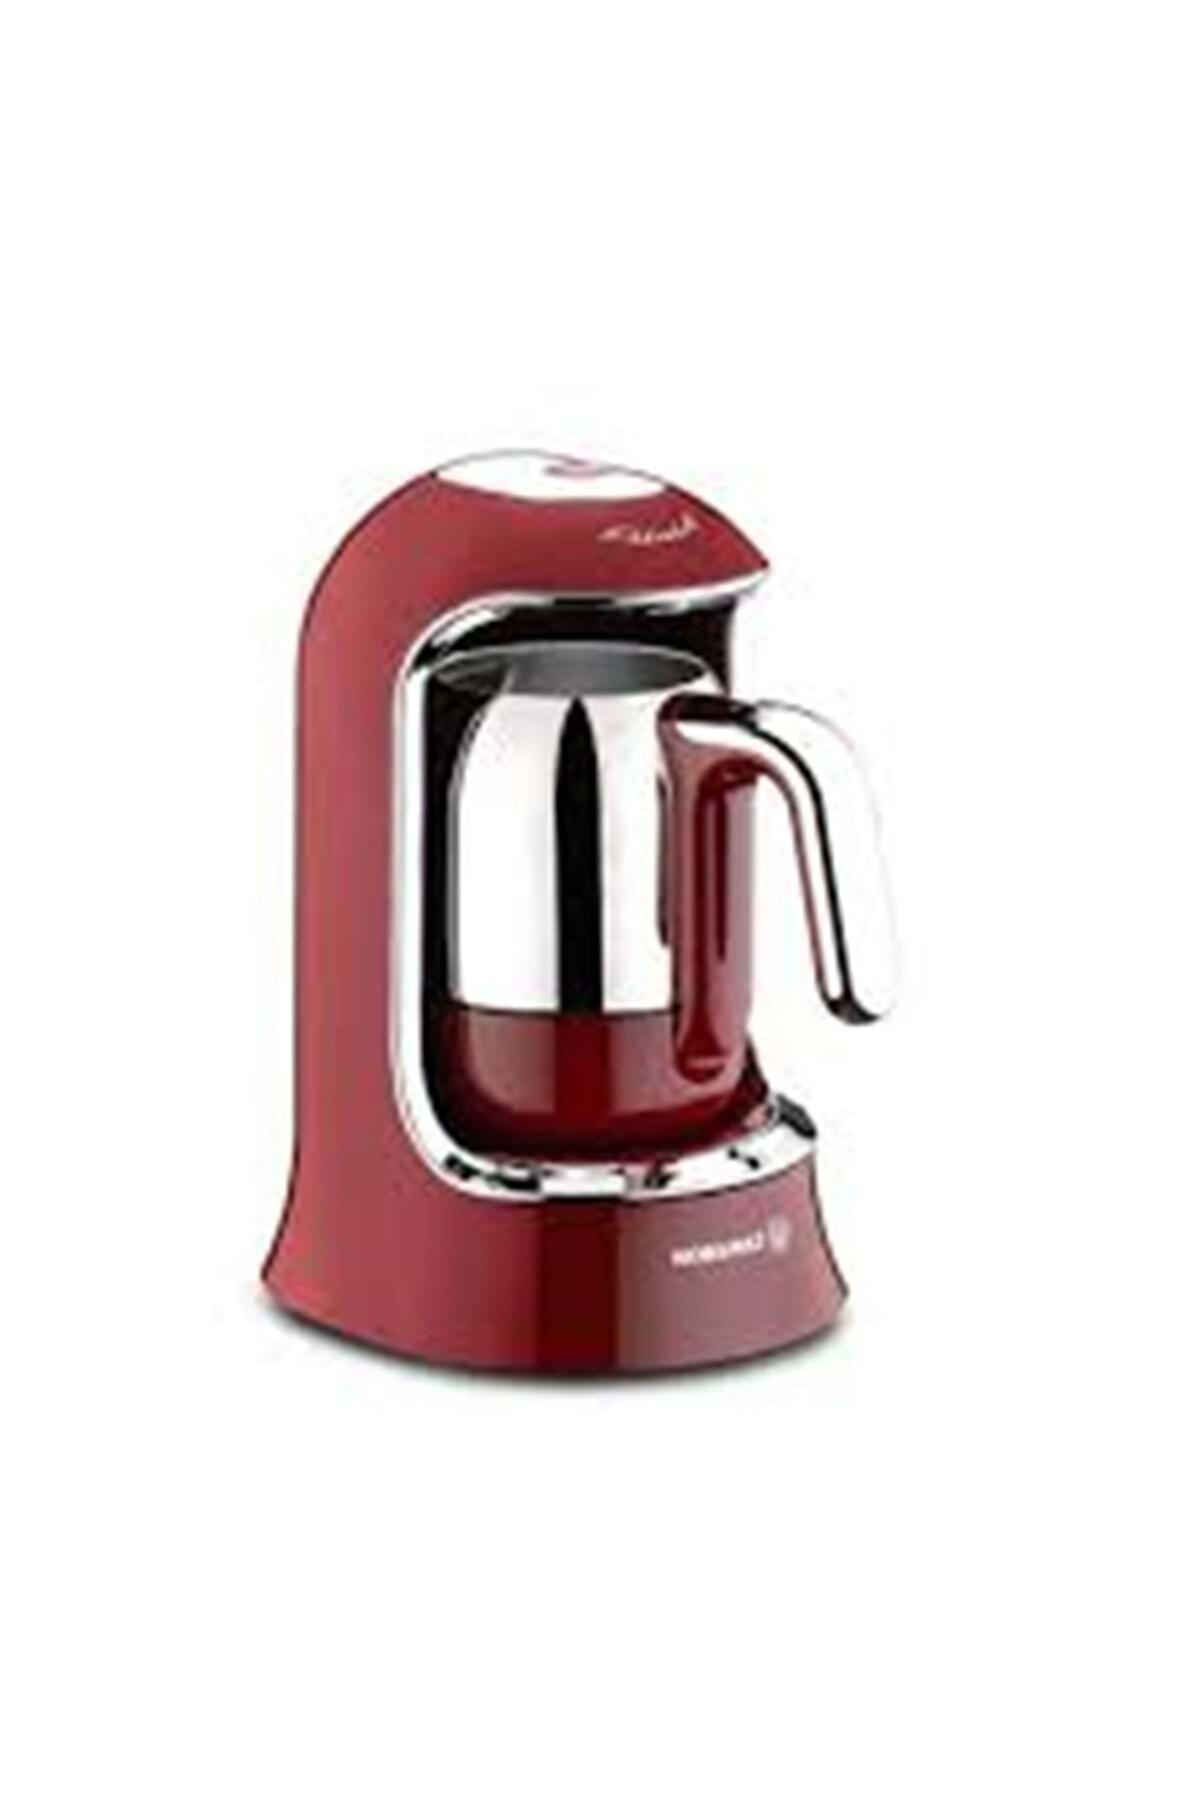 KORKMAZ A860-03 Kahvekolik Kırmızı Kahve Makinesi 1